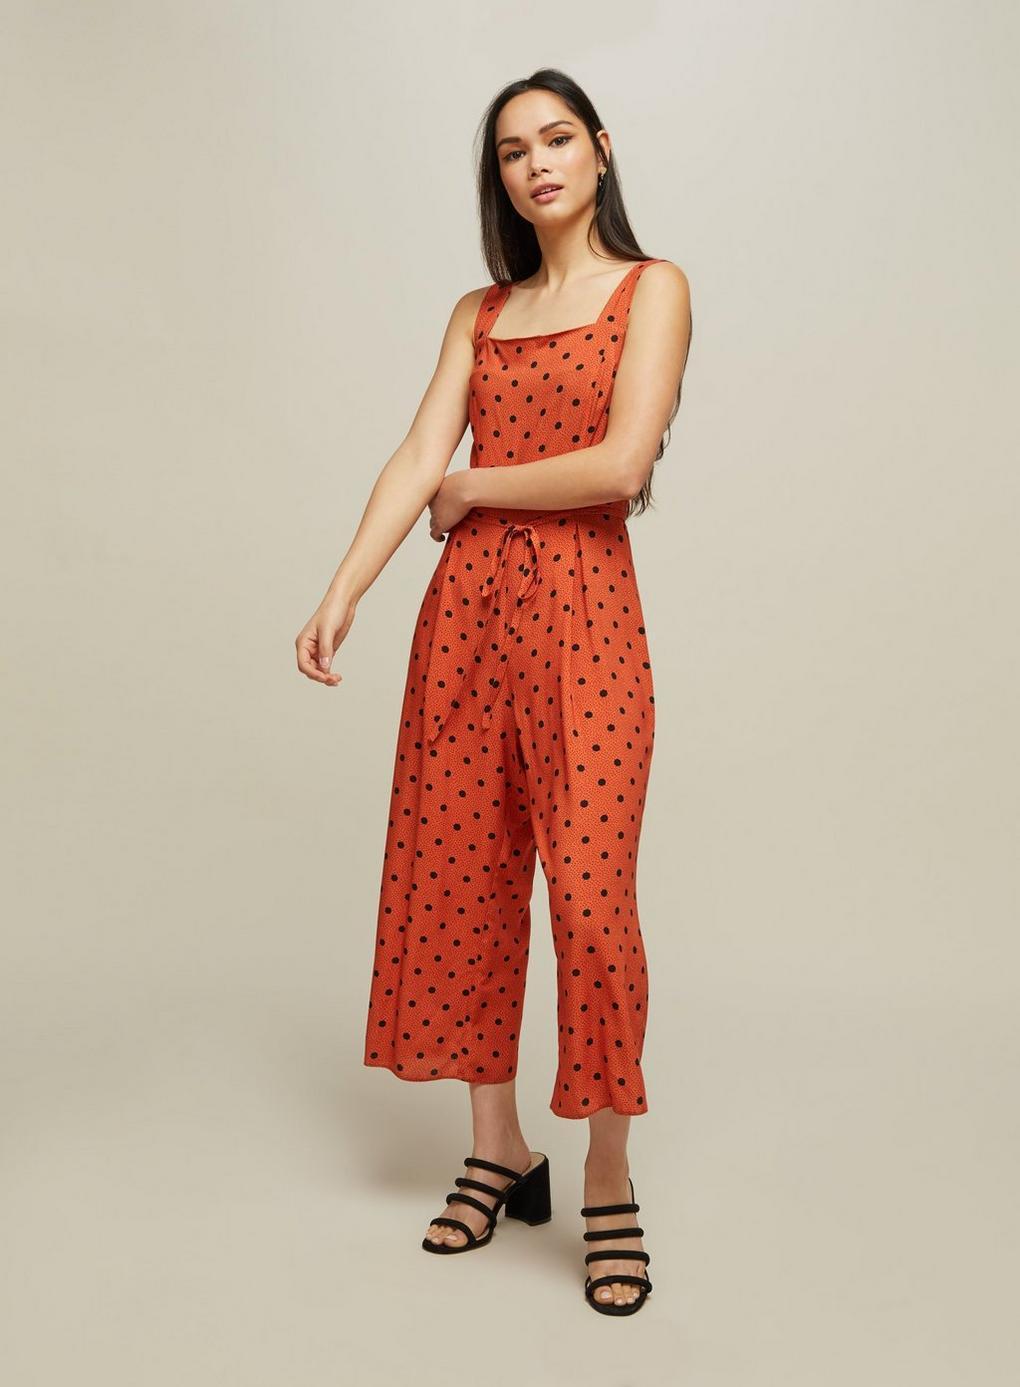 eaea5b11d7d Lyst - Miss Selfridge Rust Spot Print Pinafore Jumpsuit in Red